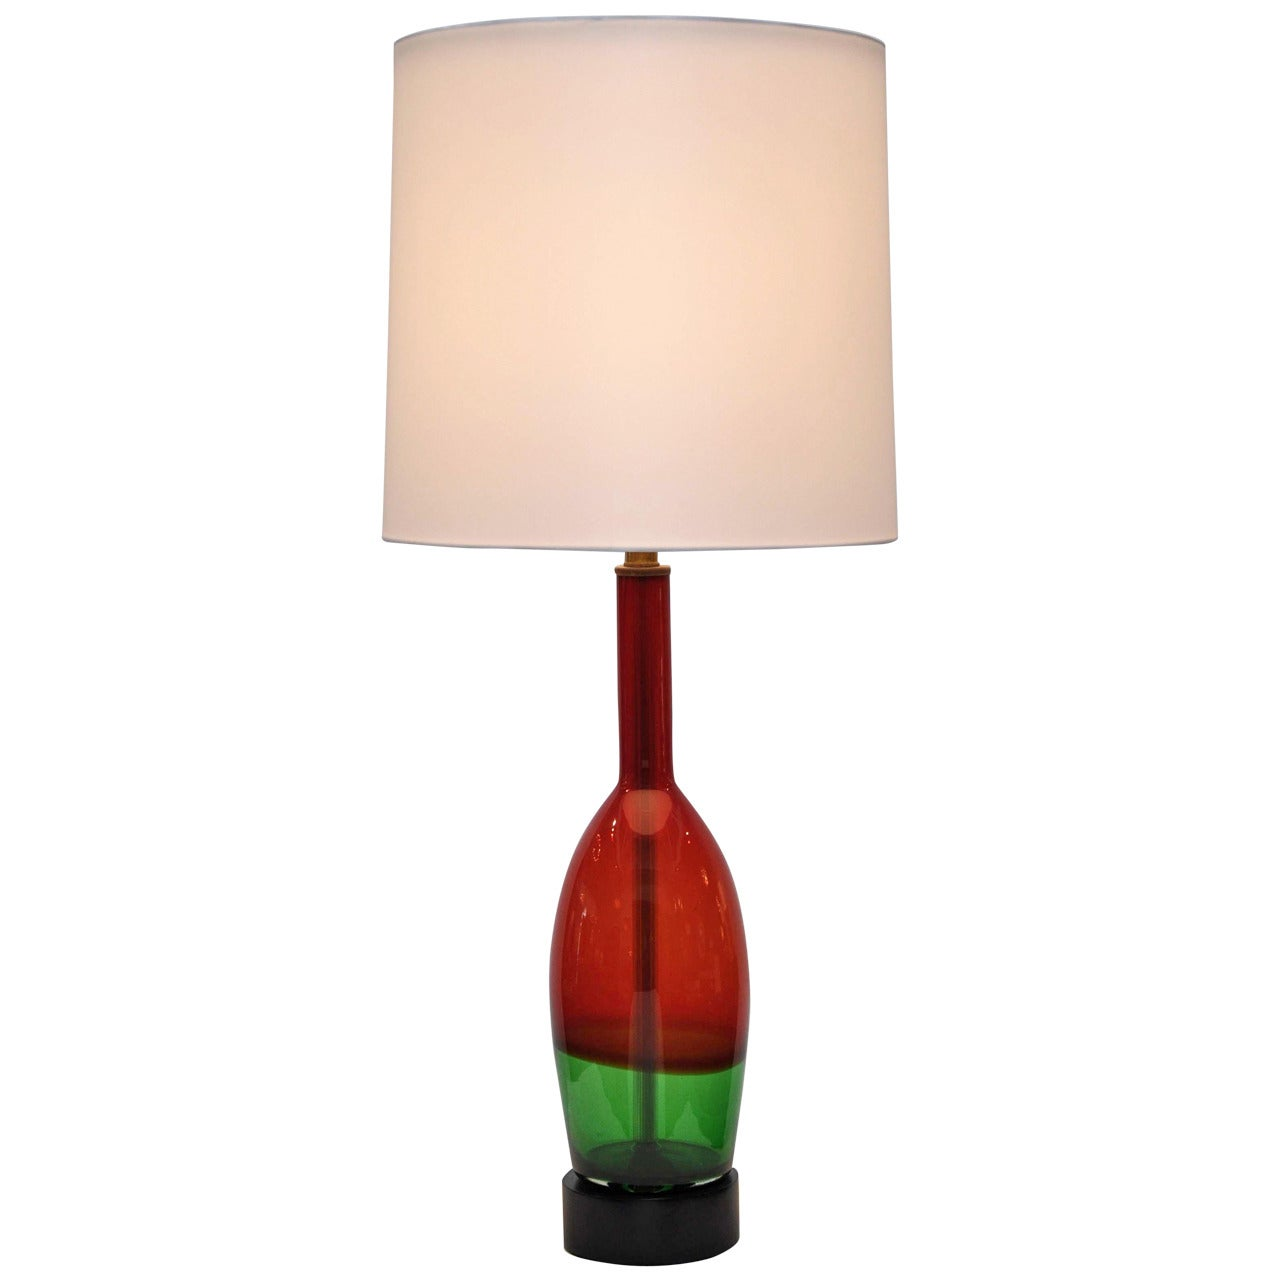 Murano Glass, Italian Table Lamp, 1950s